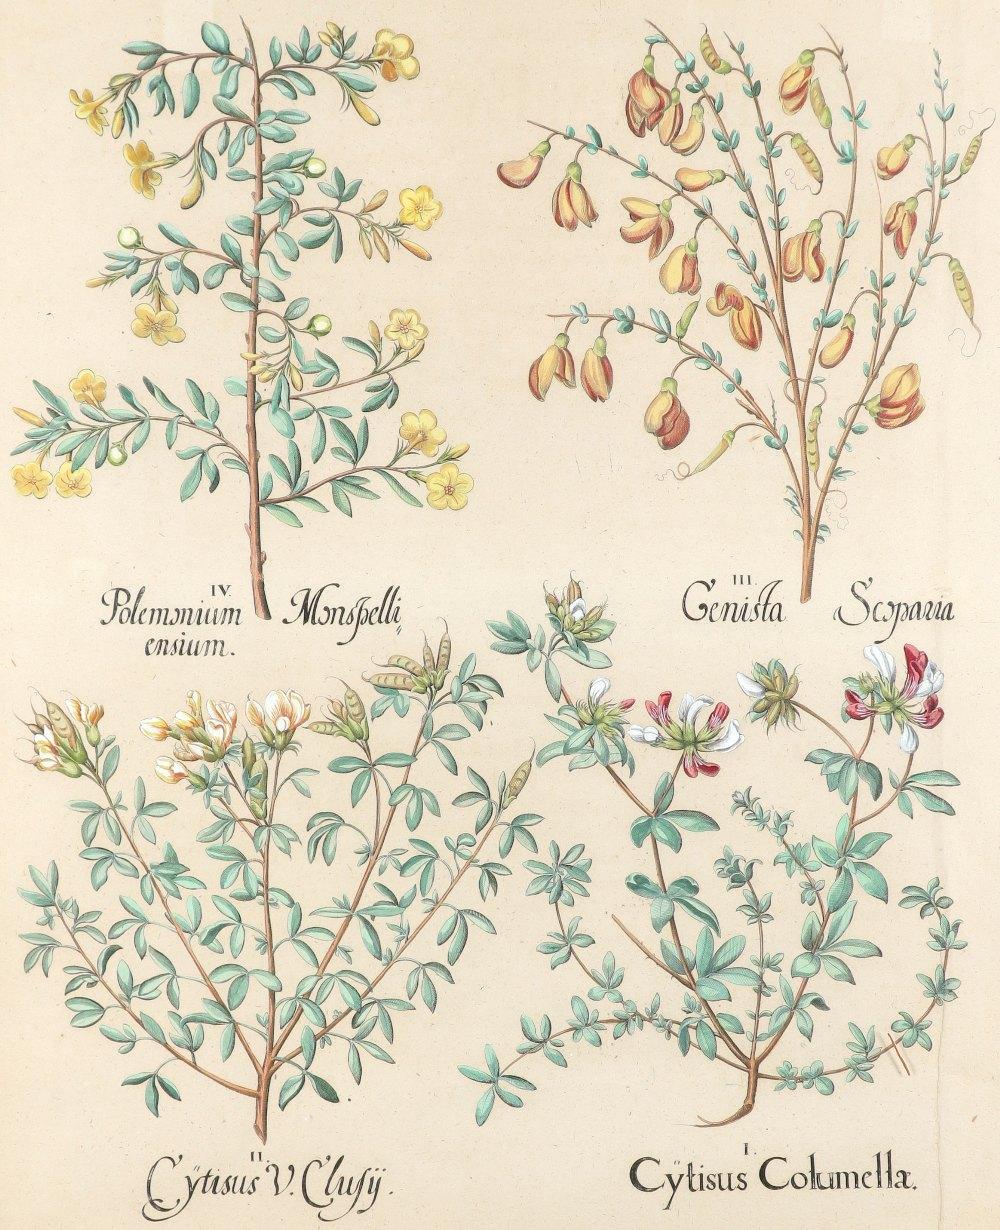 After Basilius Besler Poma flore multiplici; Aquilegia stellata flore vio laceo; Cytisus - Image 7 of 36